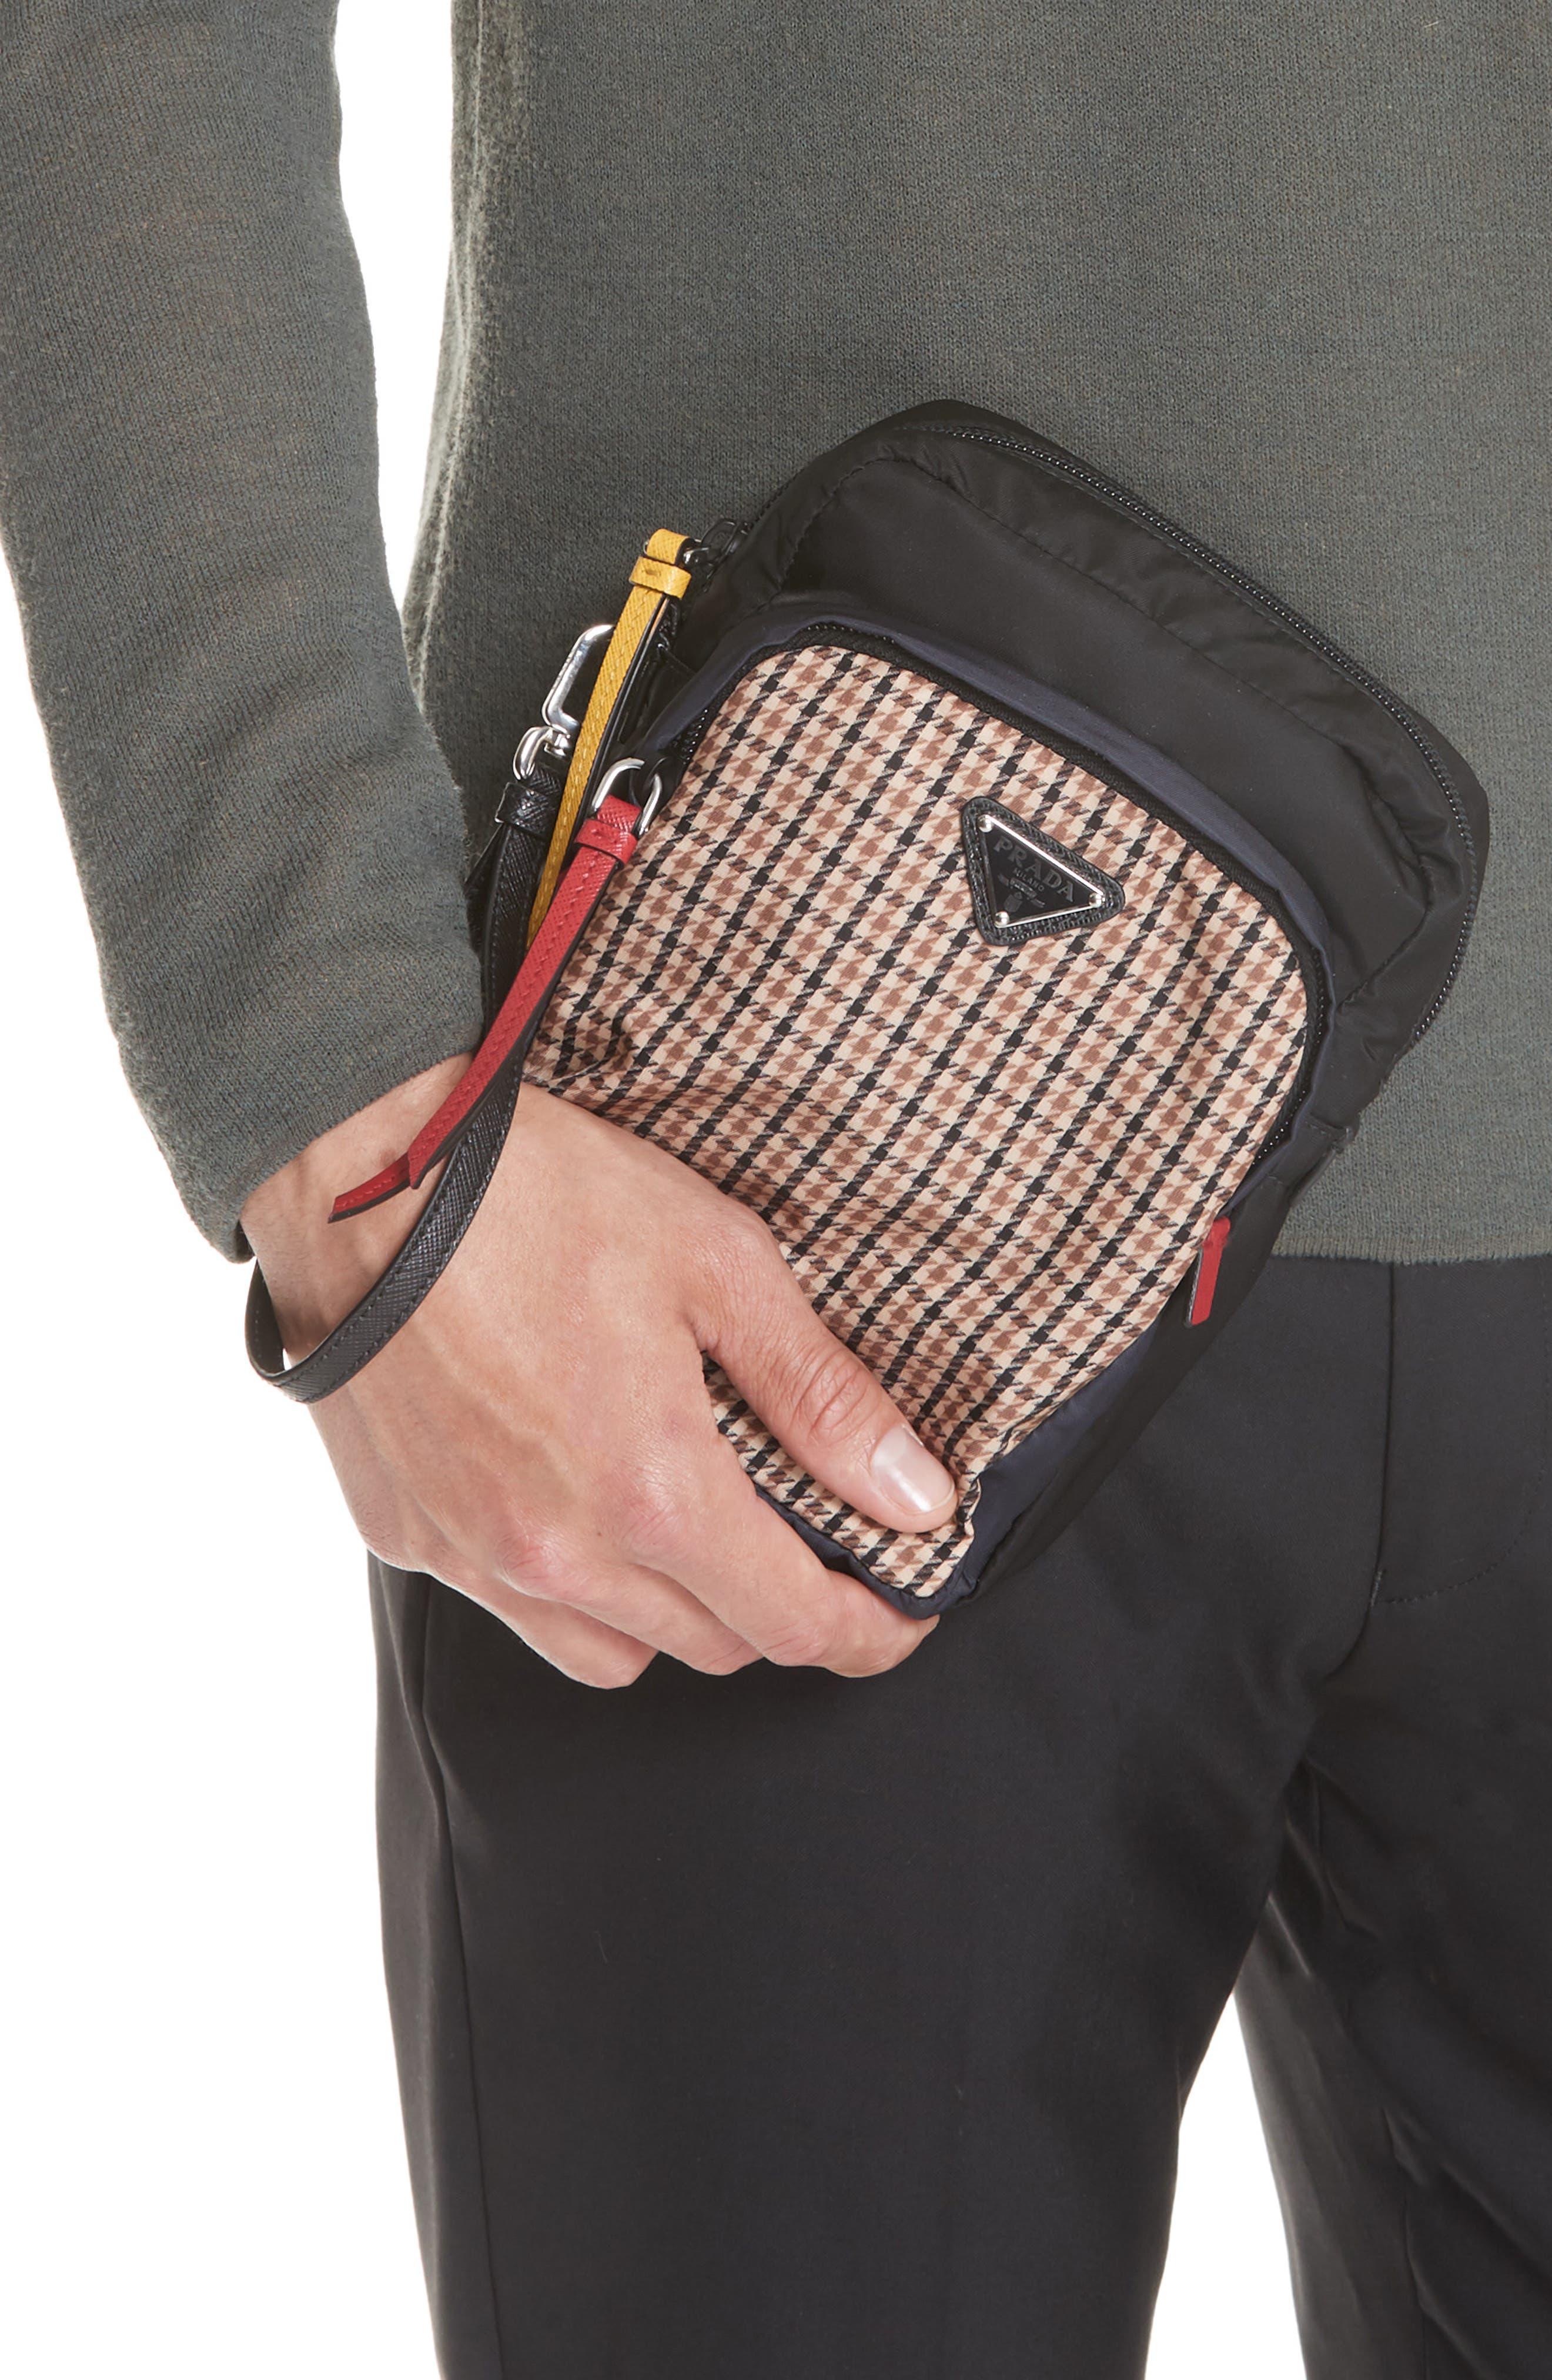 Tessudo Nylon Wrist Bag,                             Alternate thumbnail 2, color,                             CAMEL